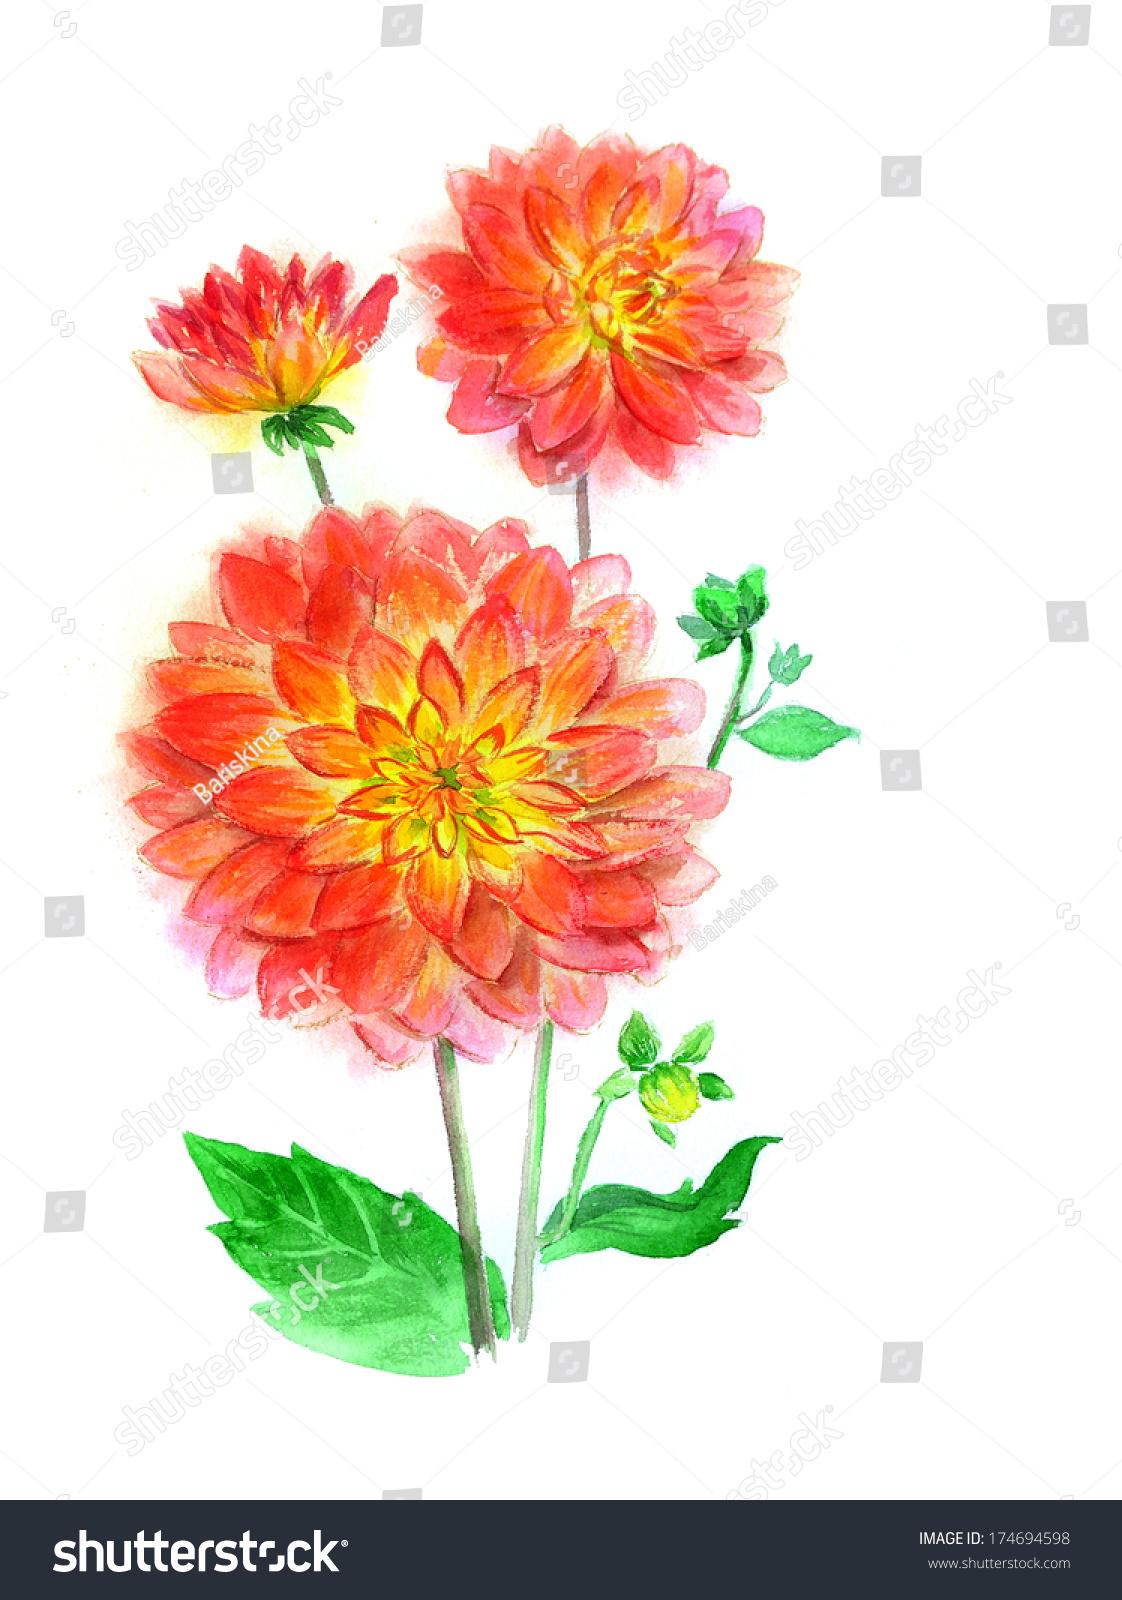 Dahlia Flower Drawing Watercolor Stock Illustration 174694598